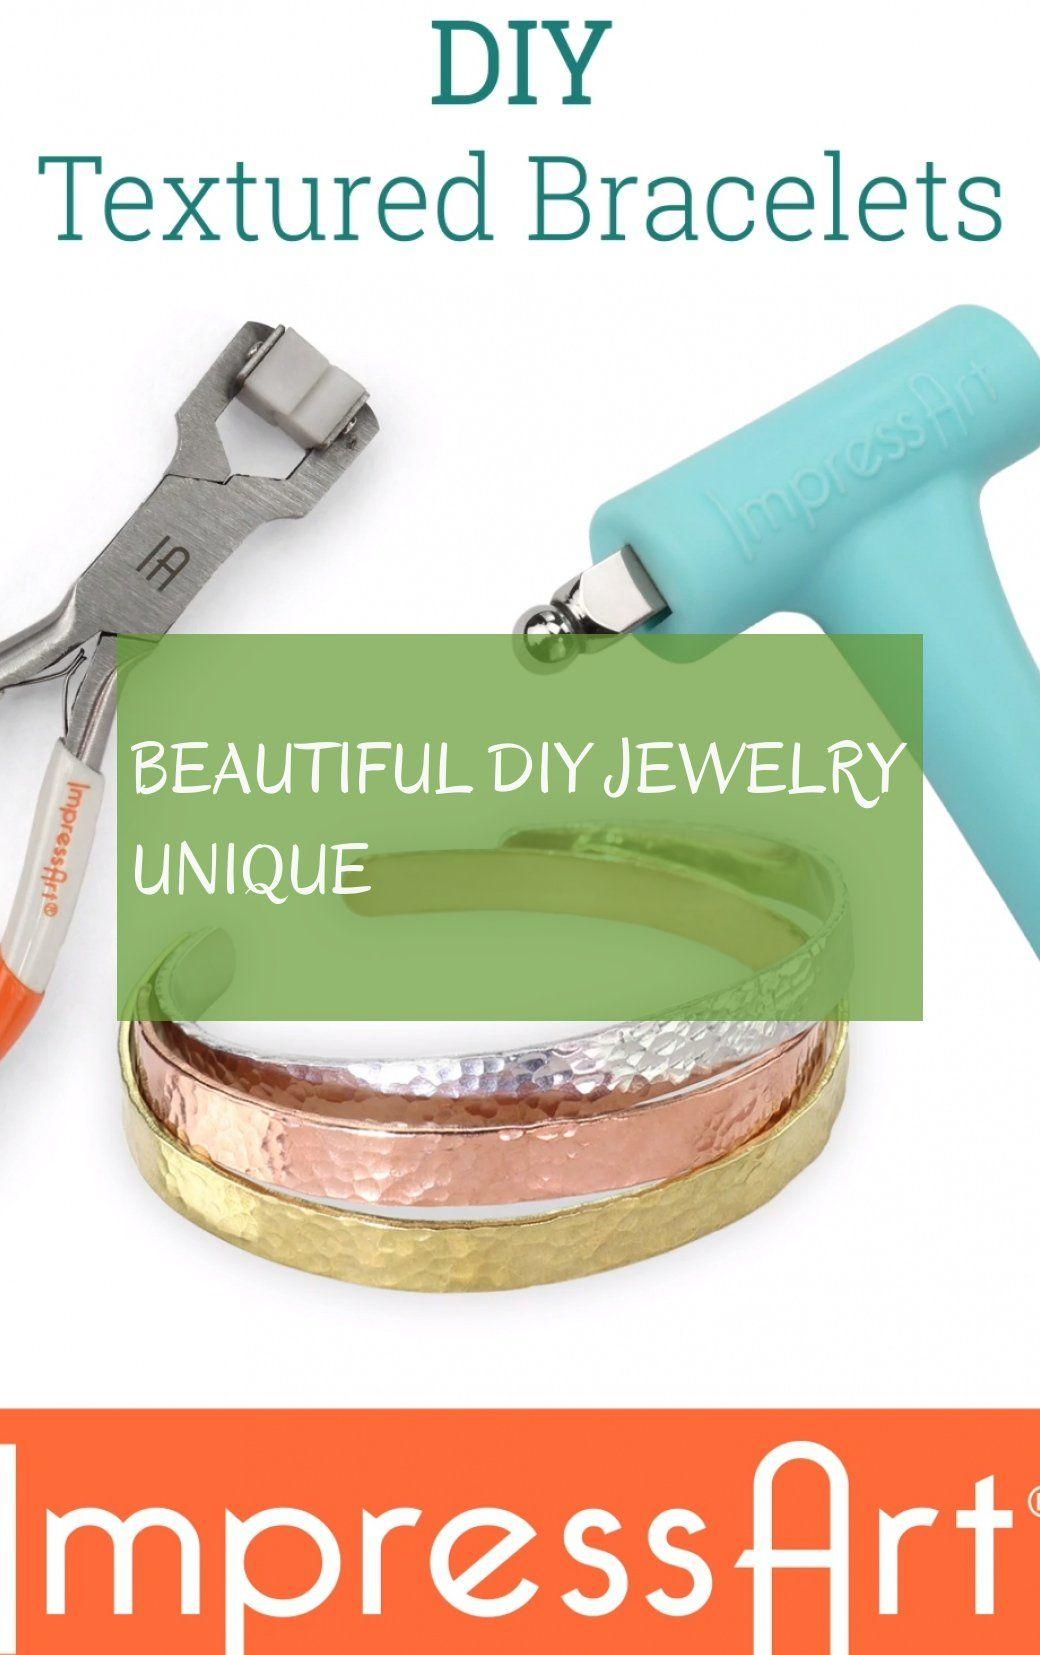 Beautiful diy jewelry unique